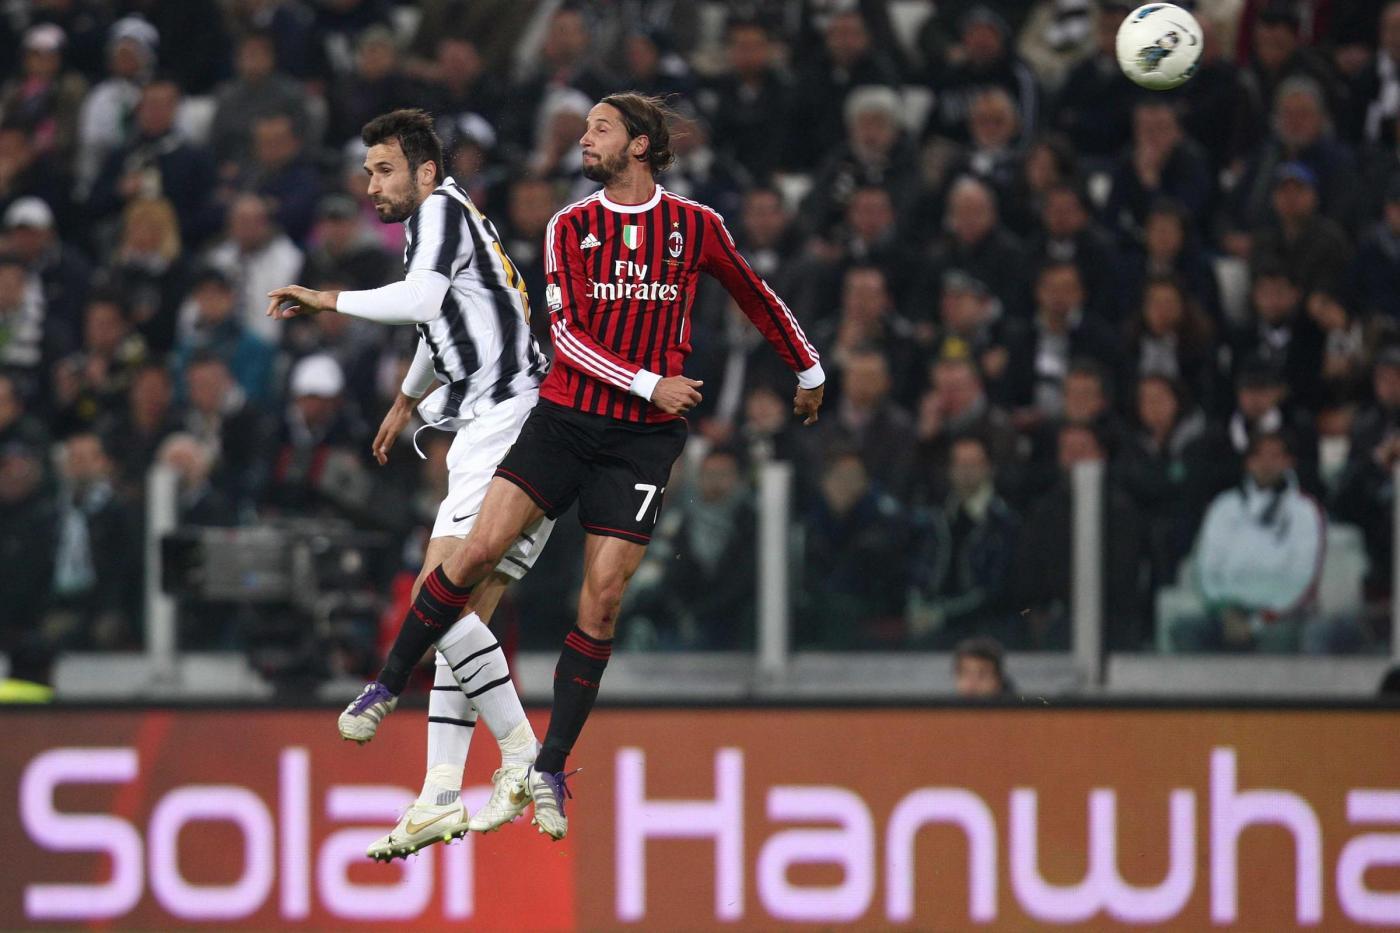 Ascolti tv martedì 20 marzo 2012: Juventus-Milan vola a oltre 9 mln